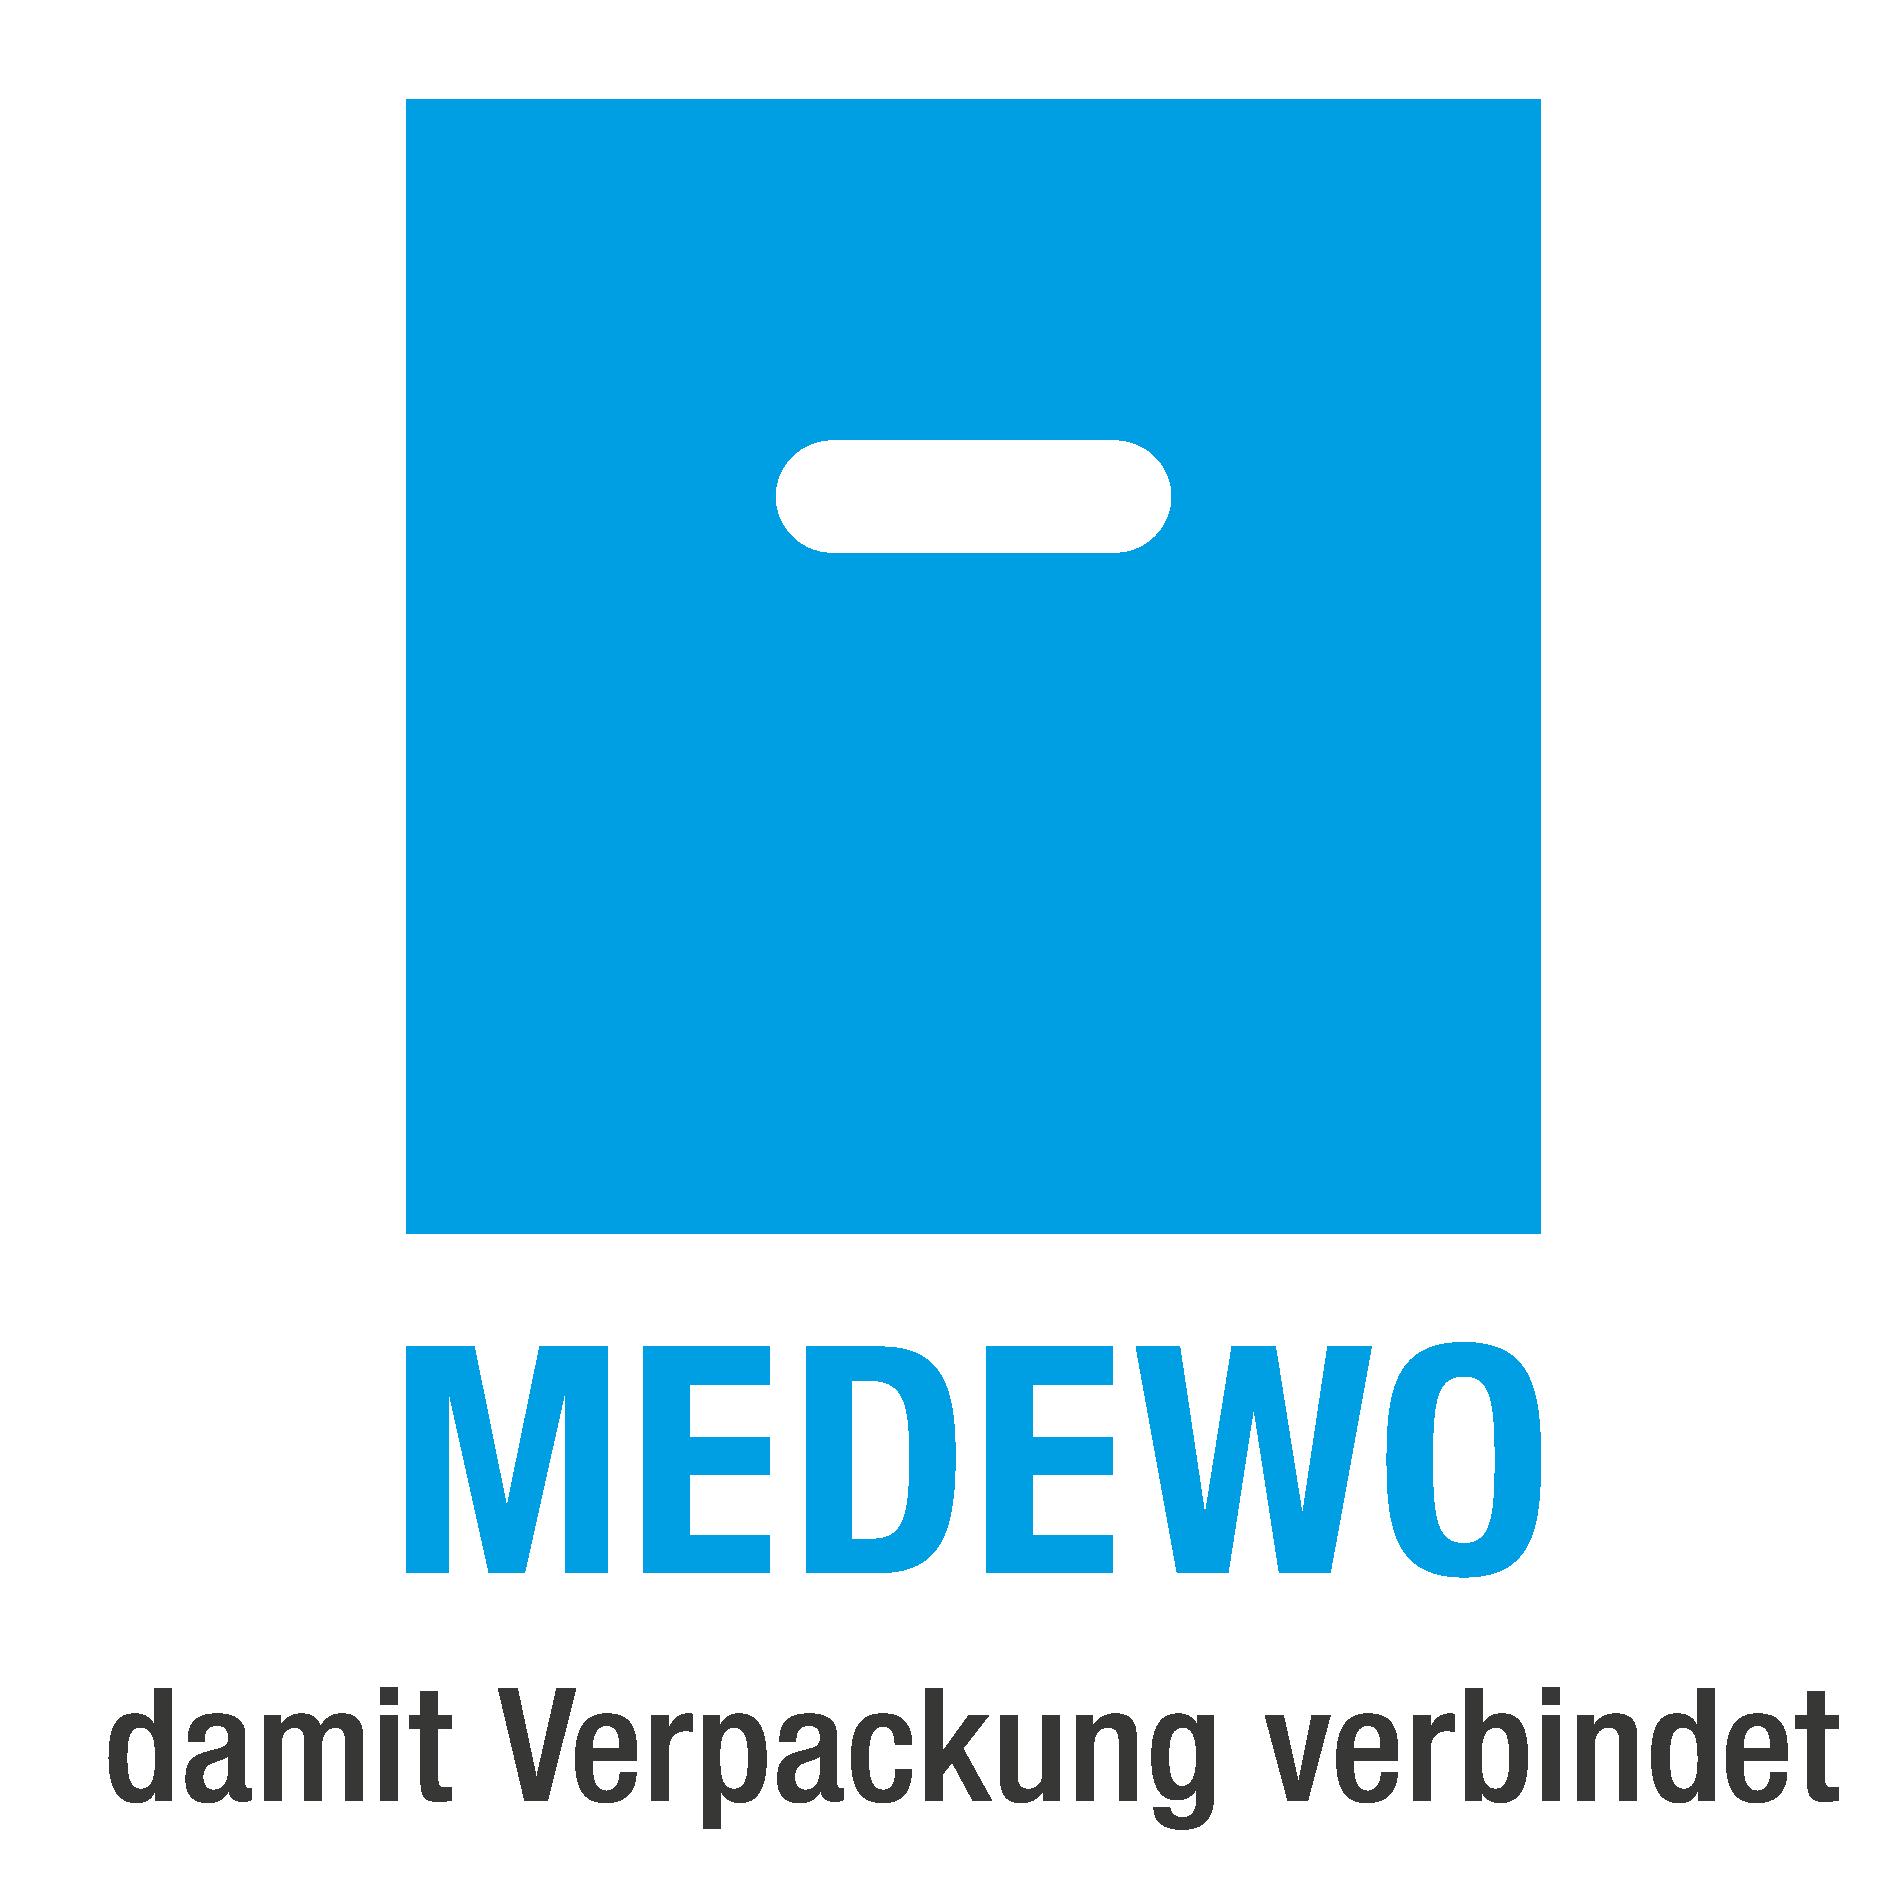 Company logo of MEDEWO GmbH